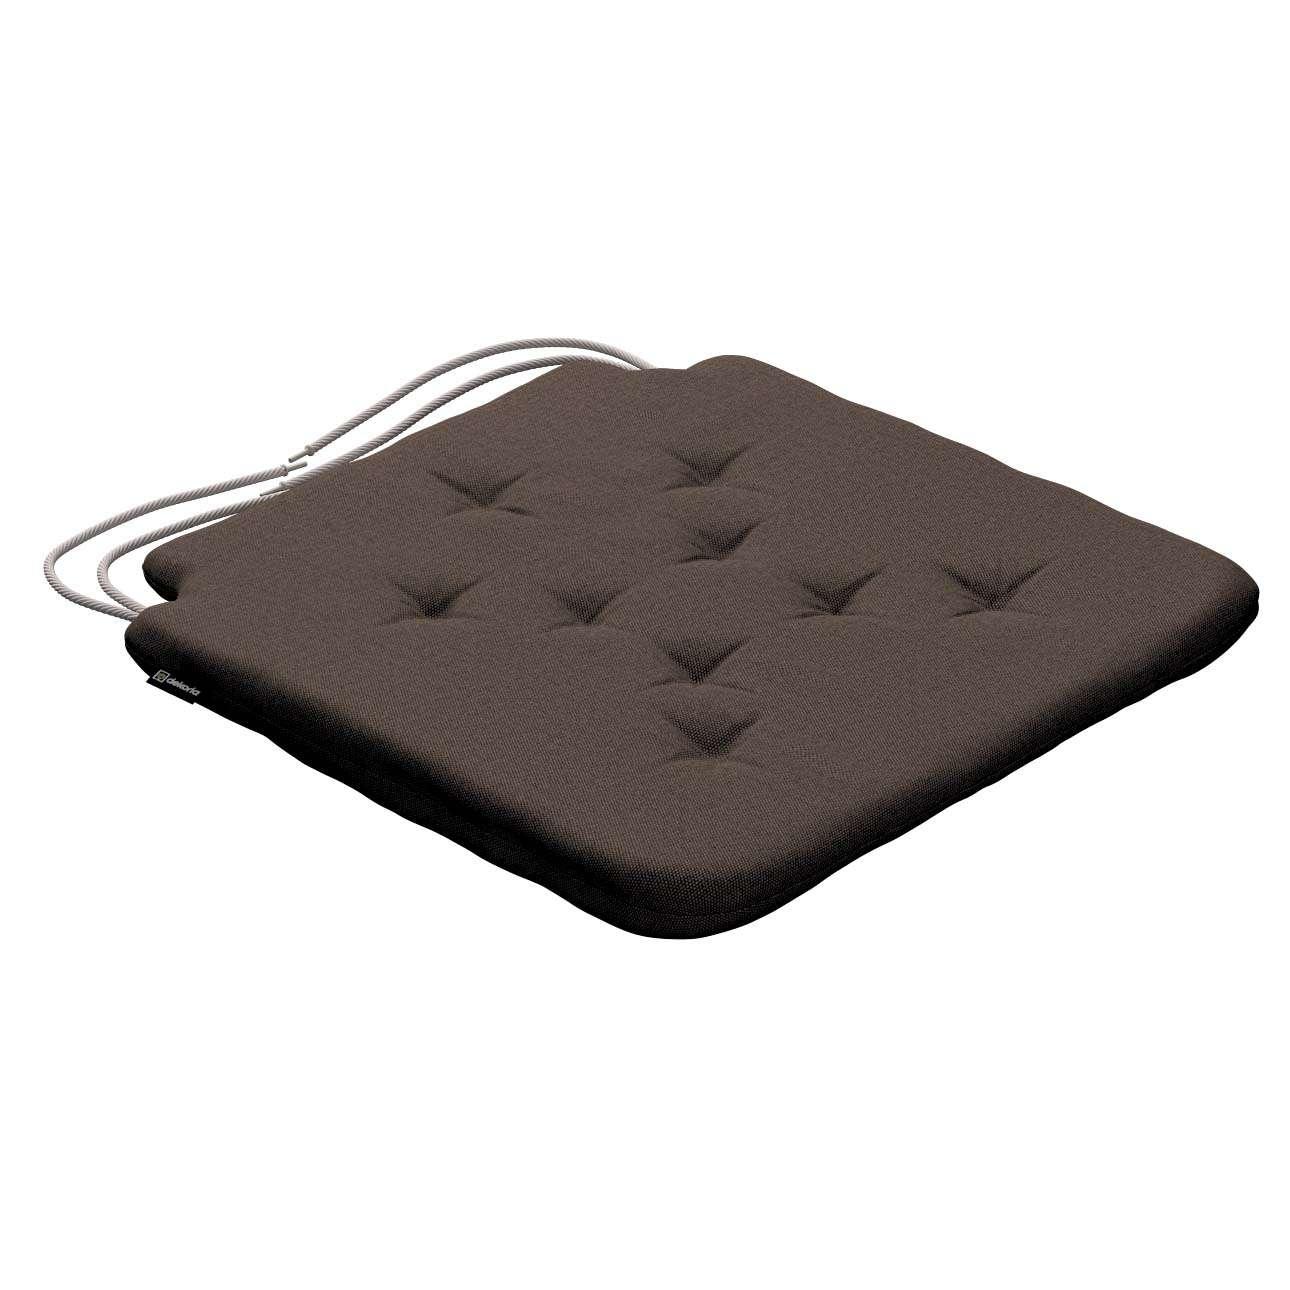 Kėdės pagalvėlė Olek  42 x 41 x 3,5 cm kolekcijoje Etna , audinys: 705-08